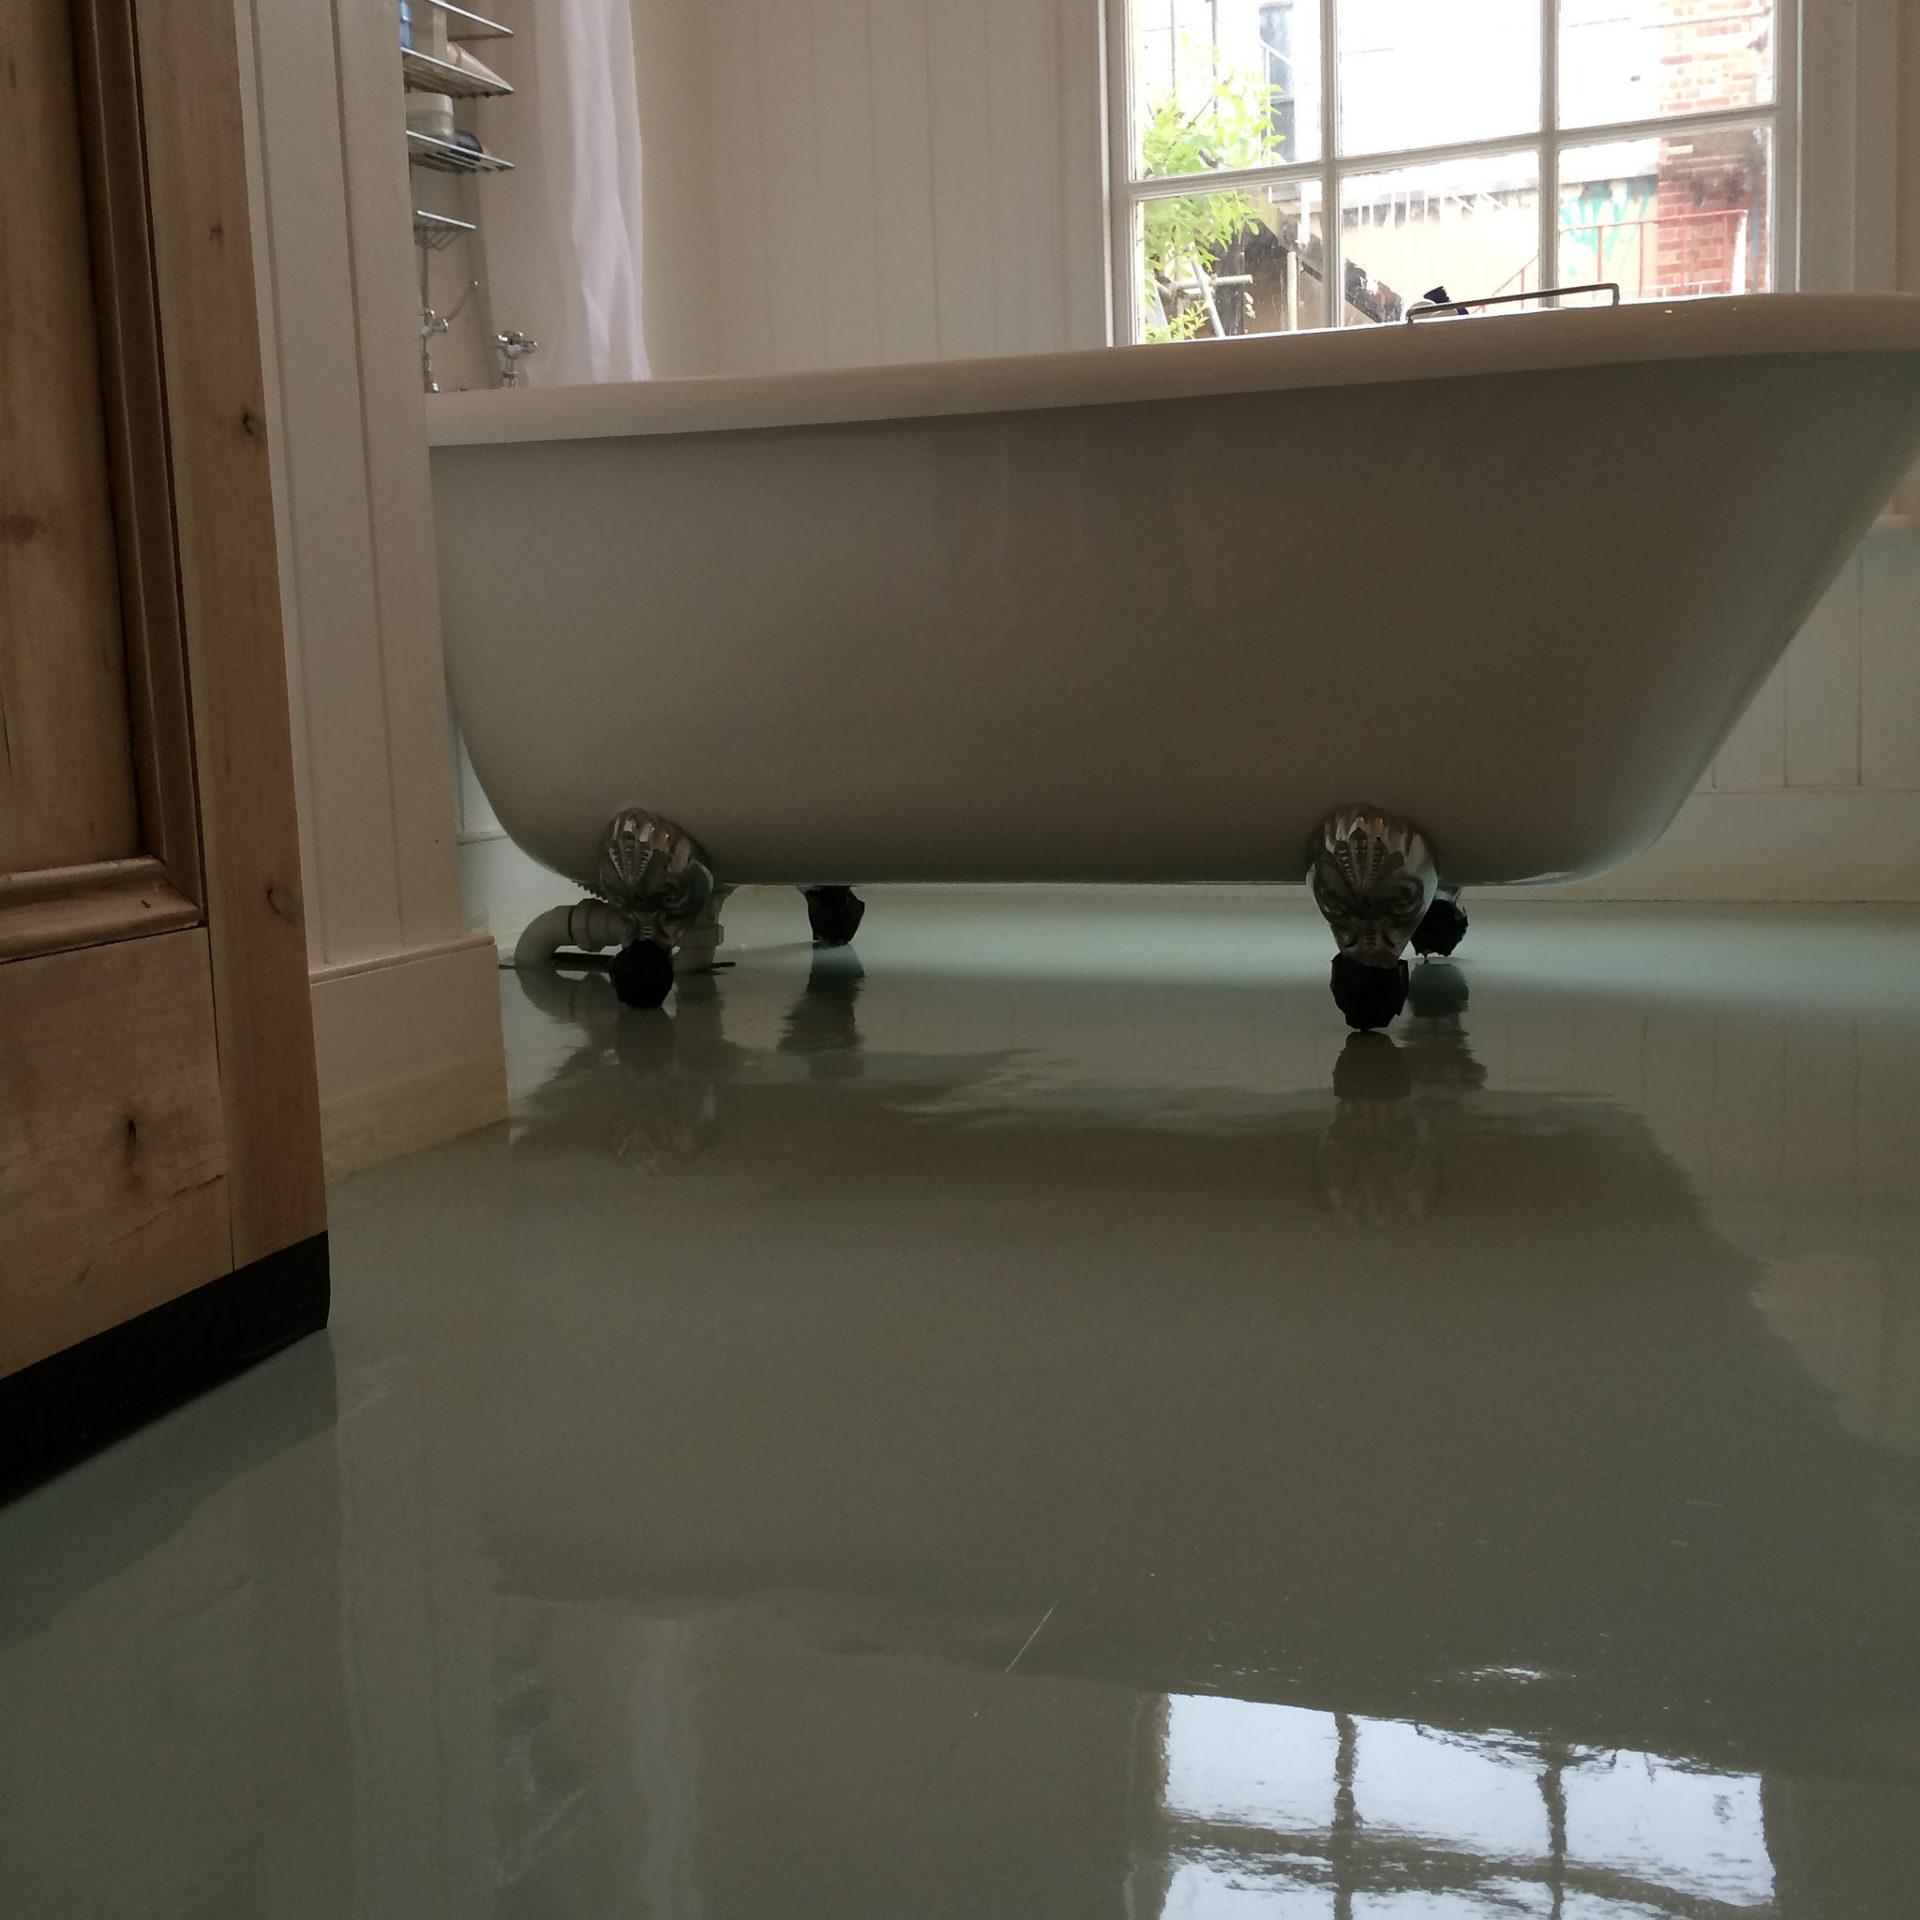 Vinyl Bathroom Floor Cleaner Sealer Brighton Hove East Sussex Floor Polishing Services Ltd